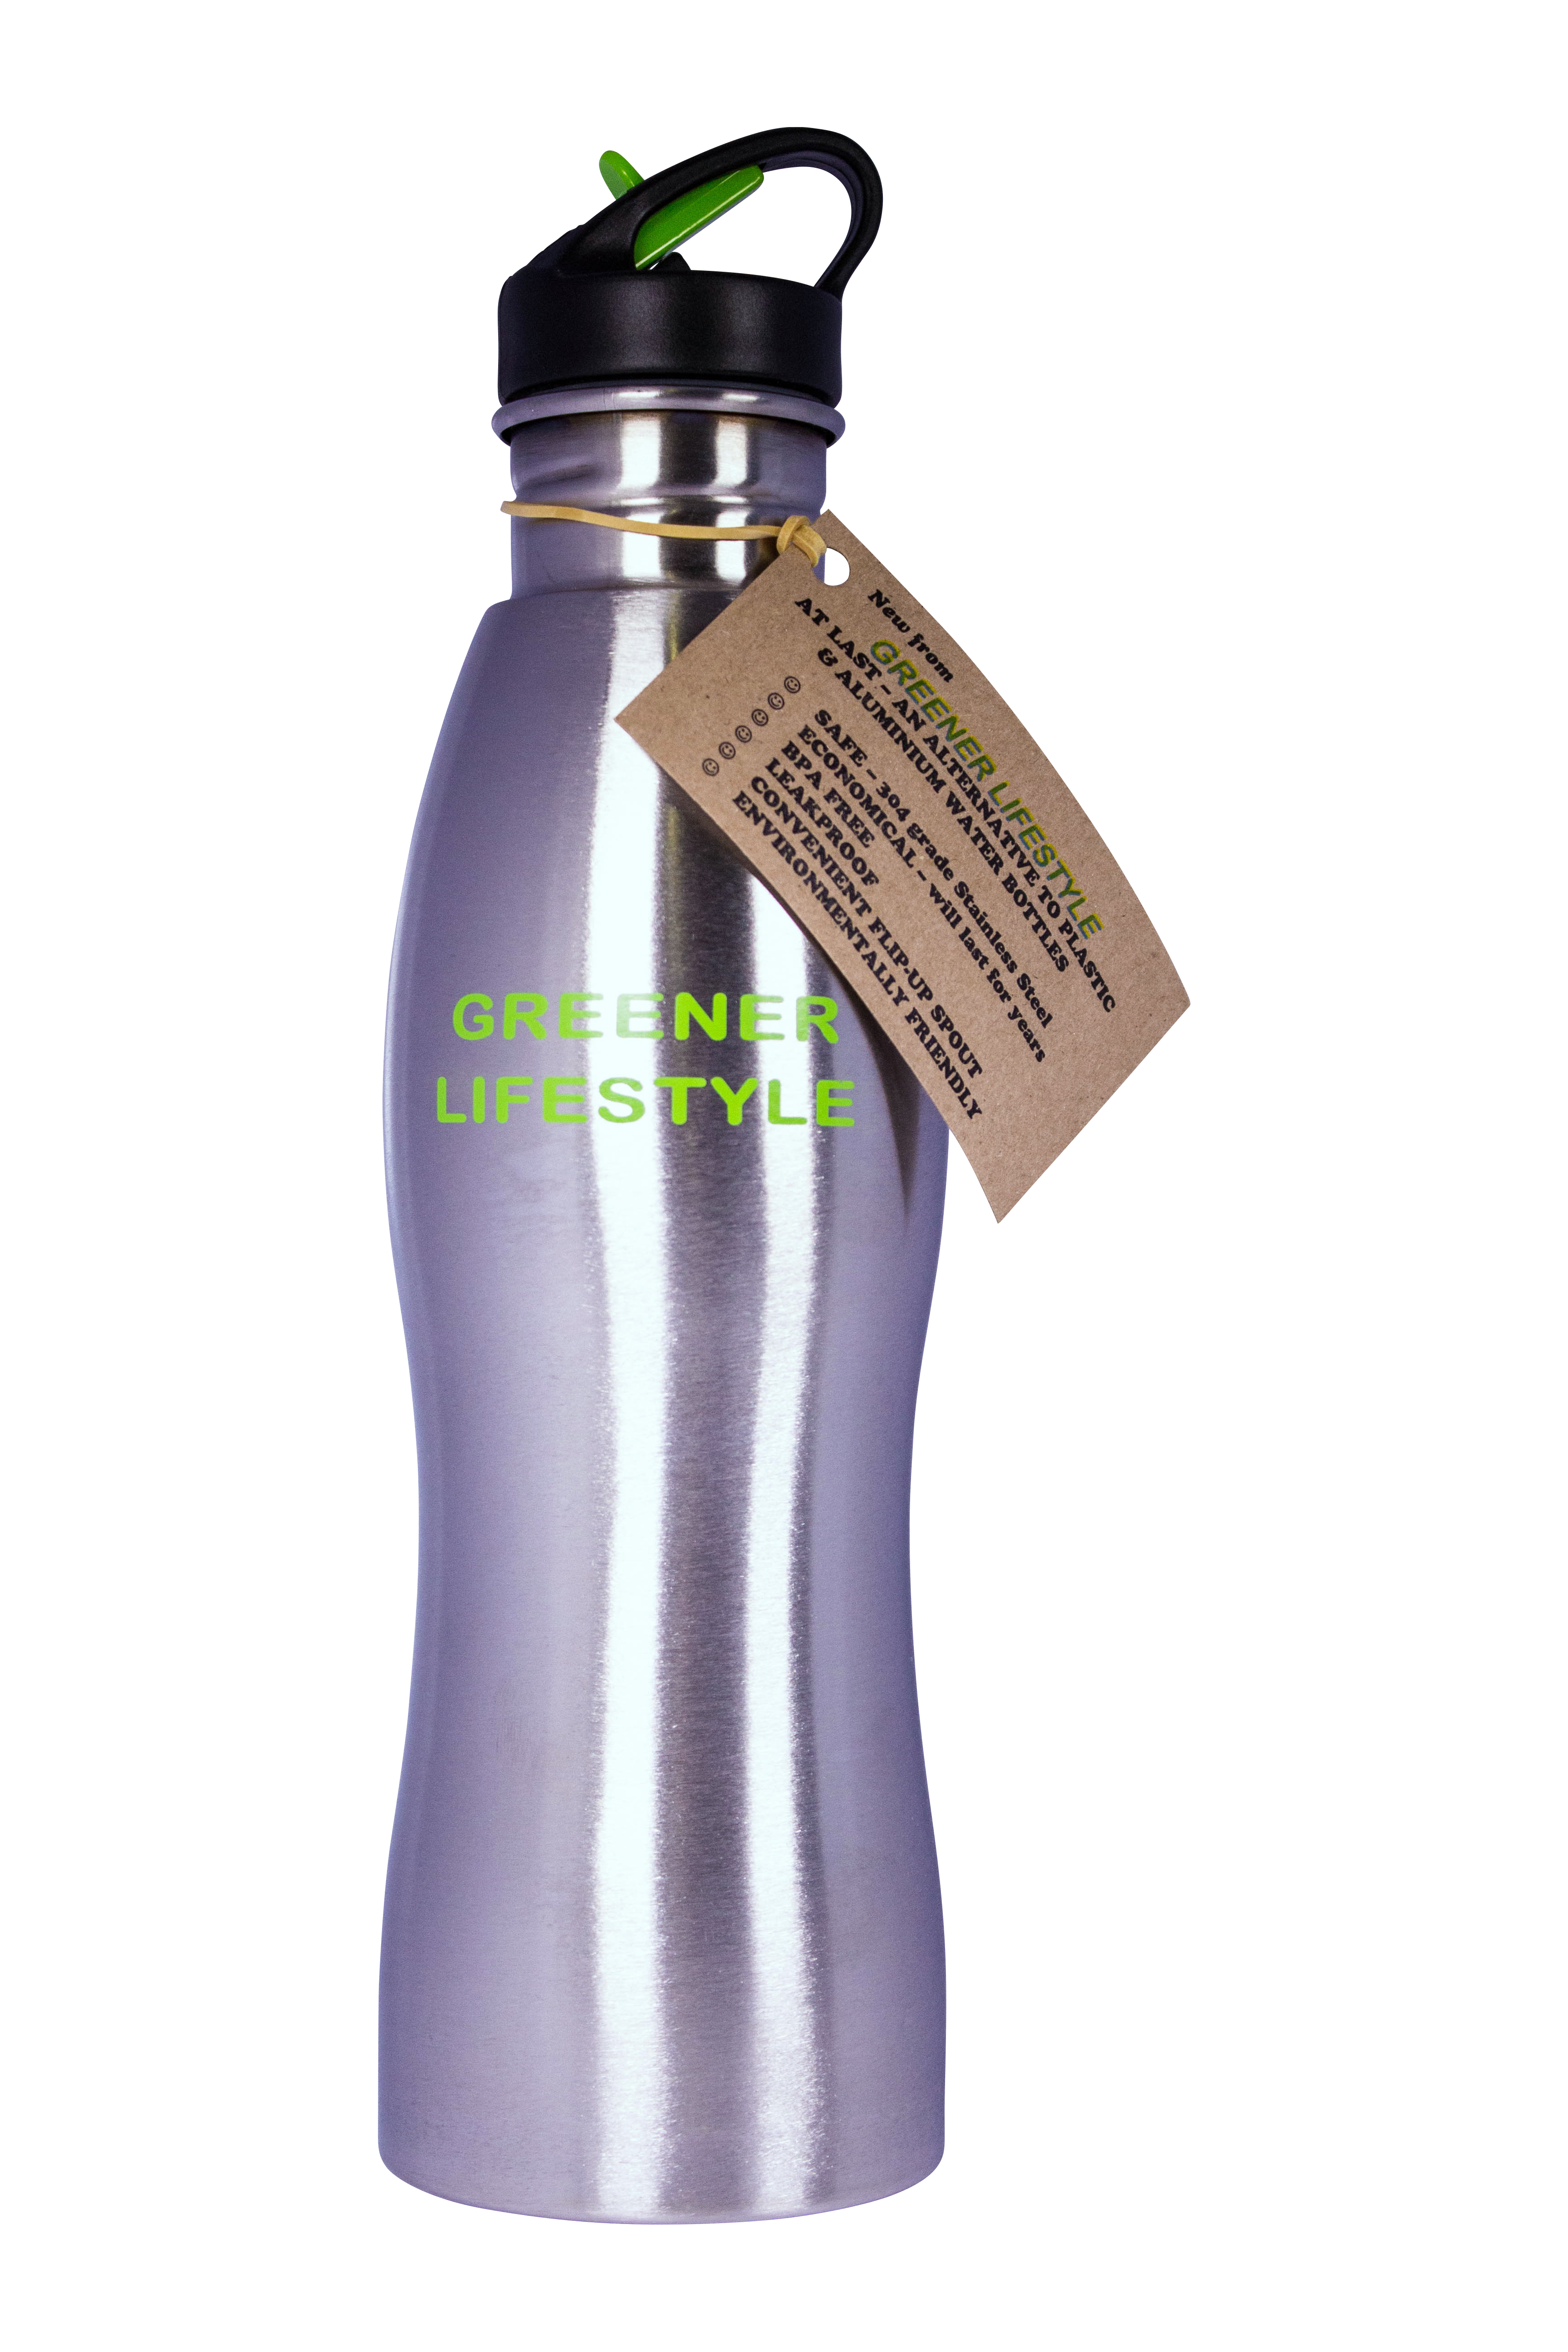 greener-lifestyle-stainless-steel-bottle